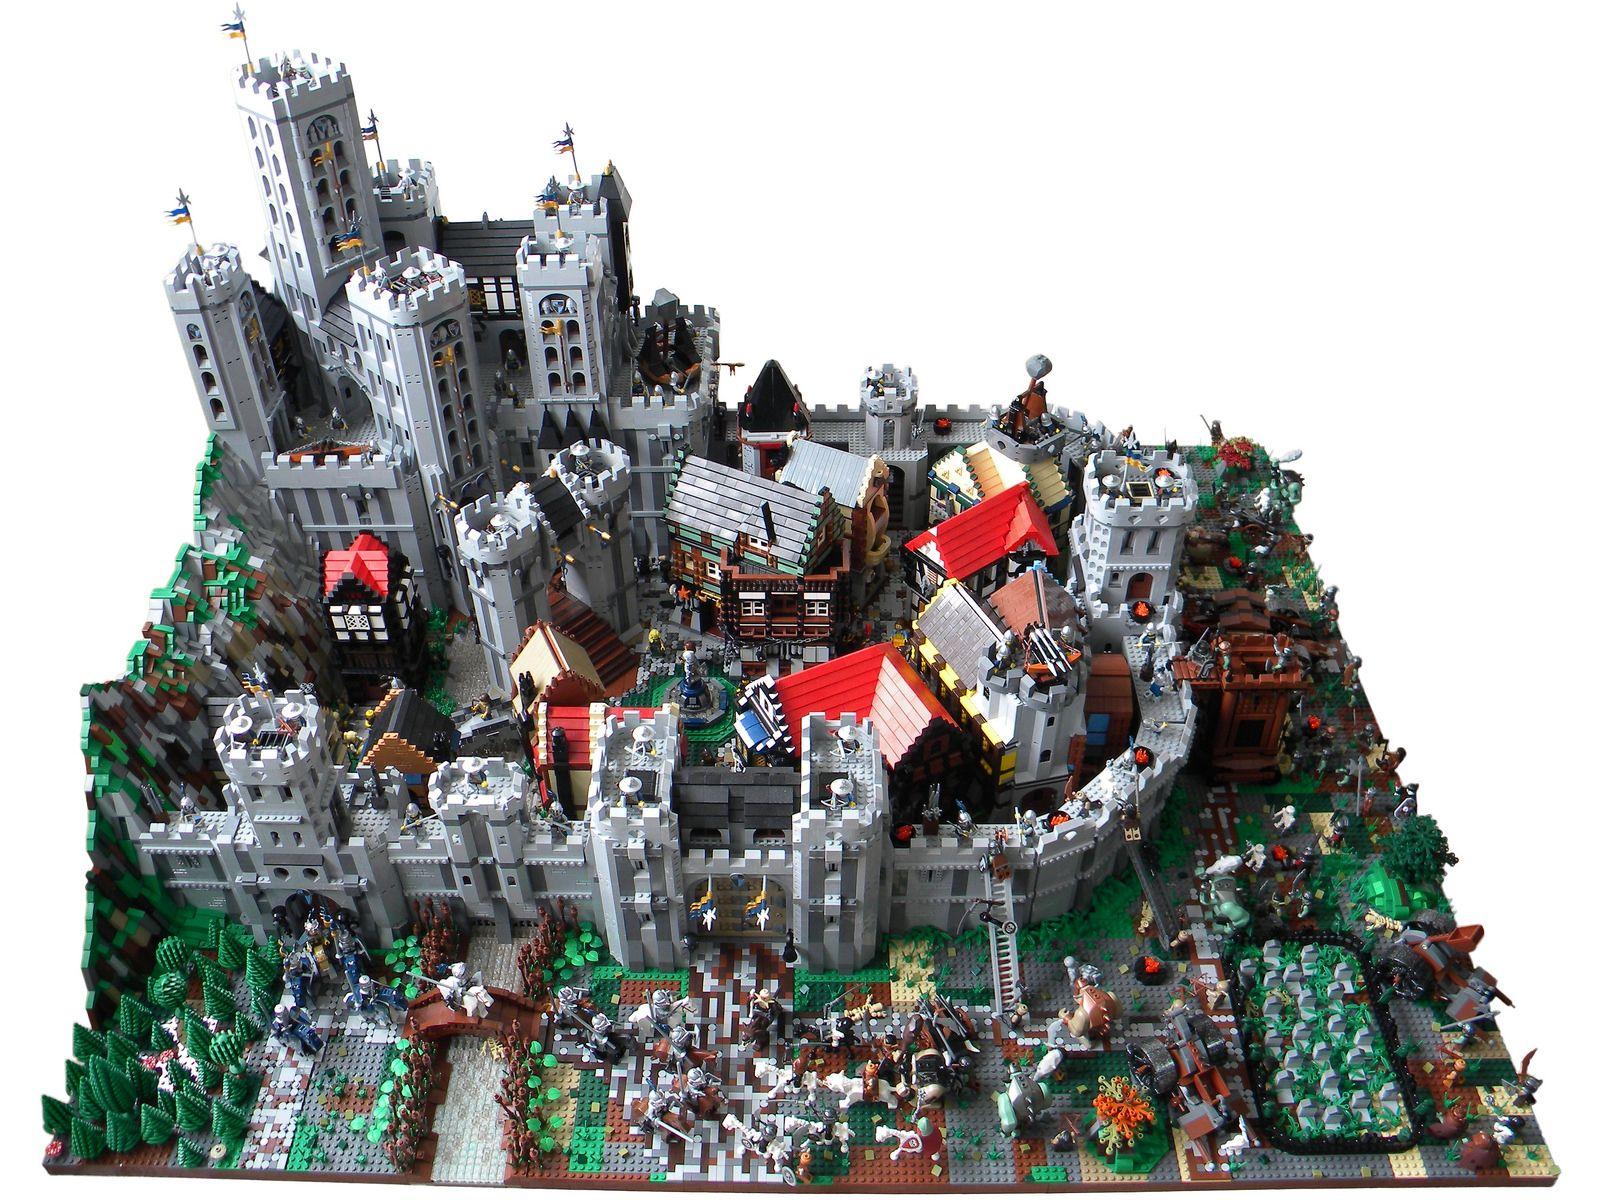 Blue Crowns Castle Siege Legos Lego Lego Creations Lego Castle